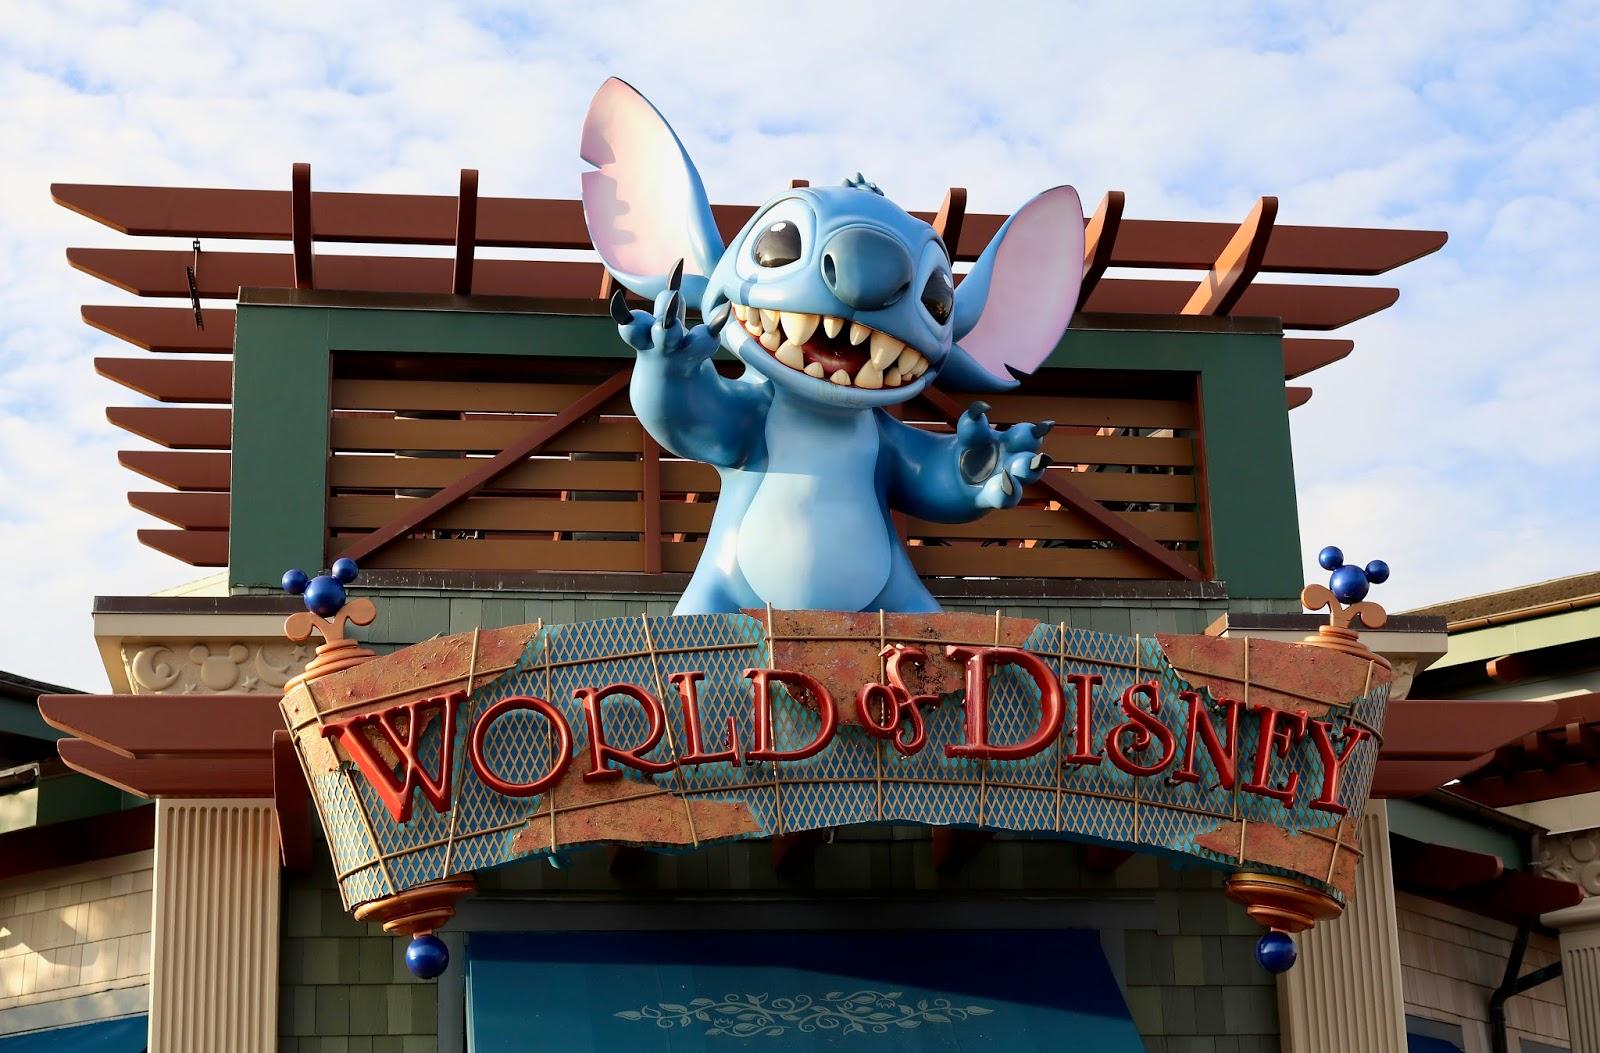 Disney-Springs-World-of-Disney-Disney-store-Orlando-Florida